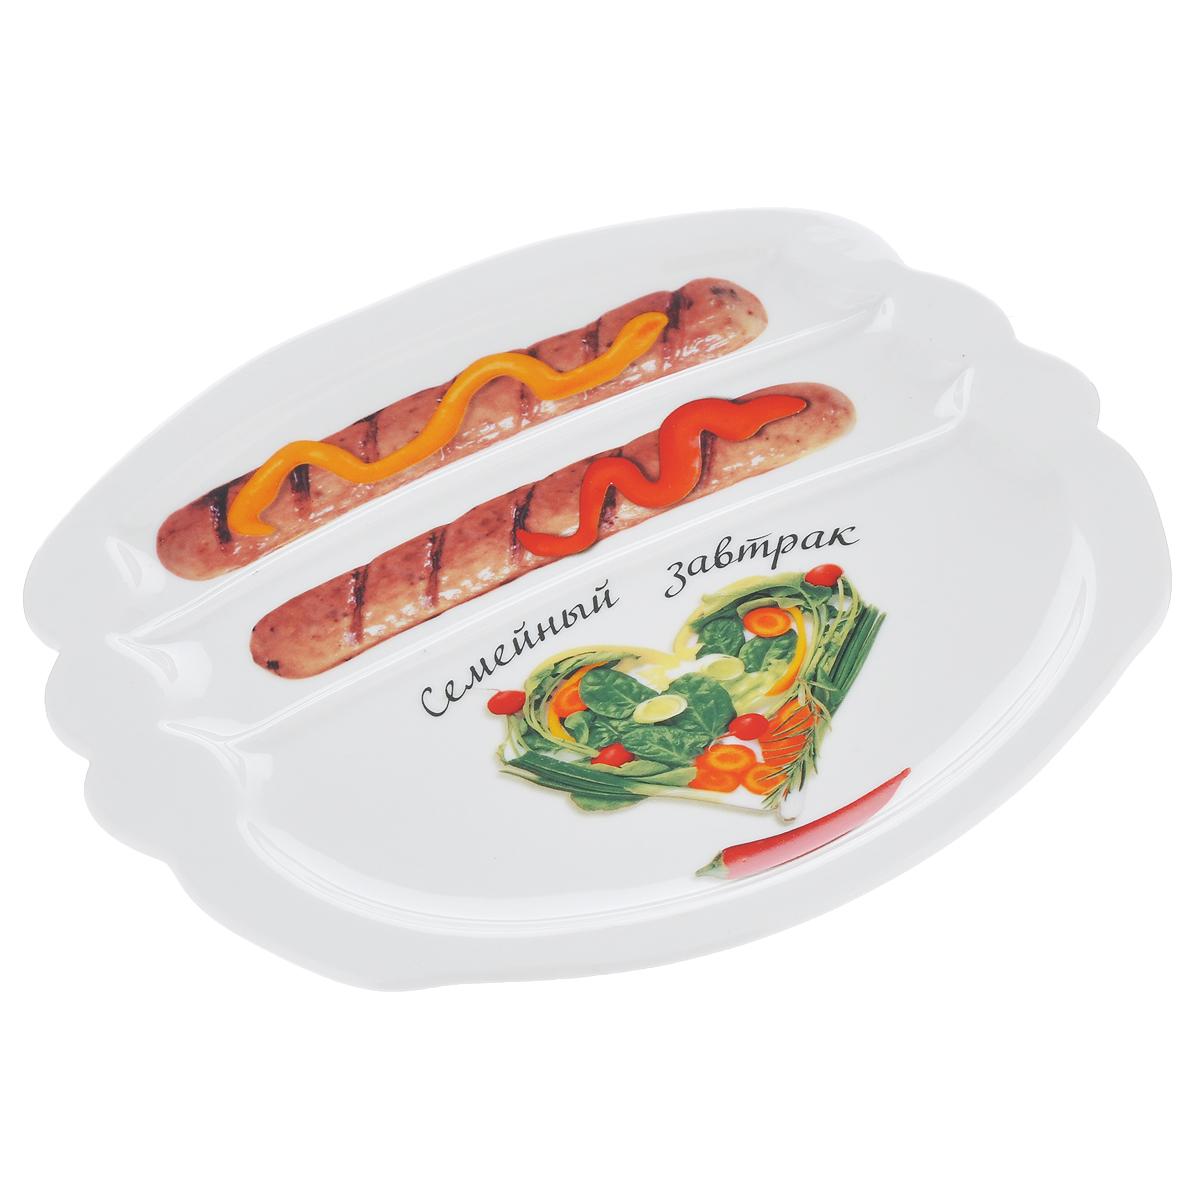 Тарелка для завтрака LarangE Семейный завтрак. Сердечный, 22,5 х 19 см тарелка для завтрака larange семейный завтрак у пирата 22 5 х 19 x 1 5 см